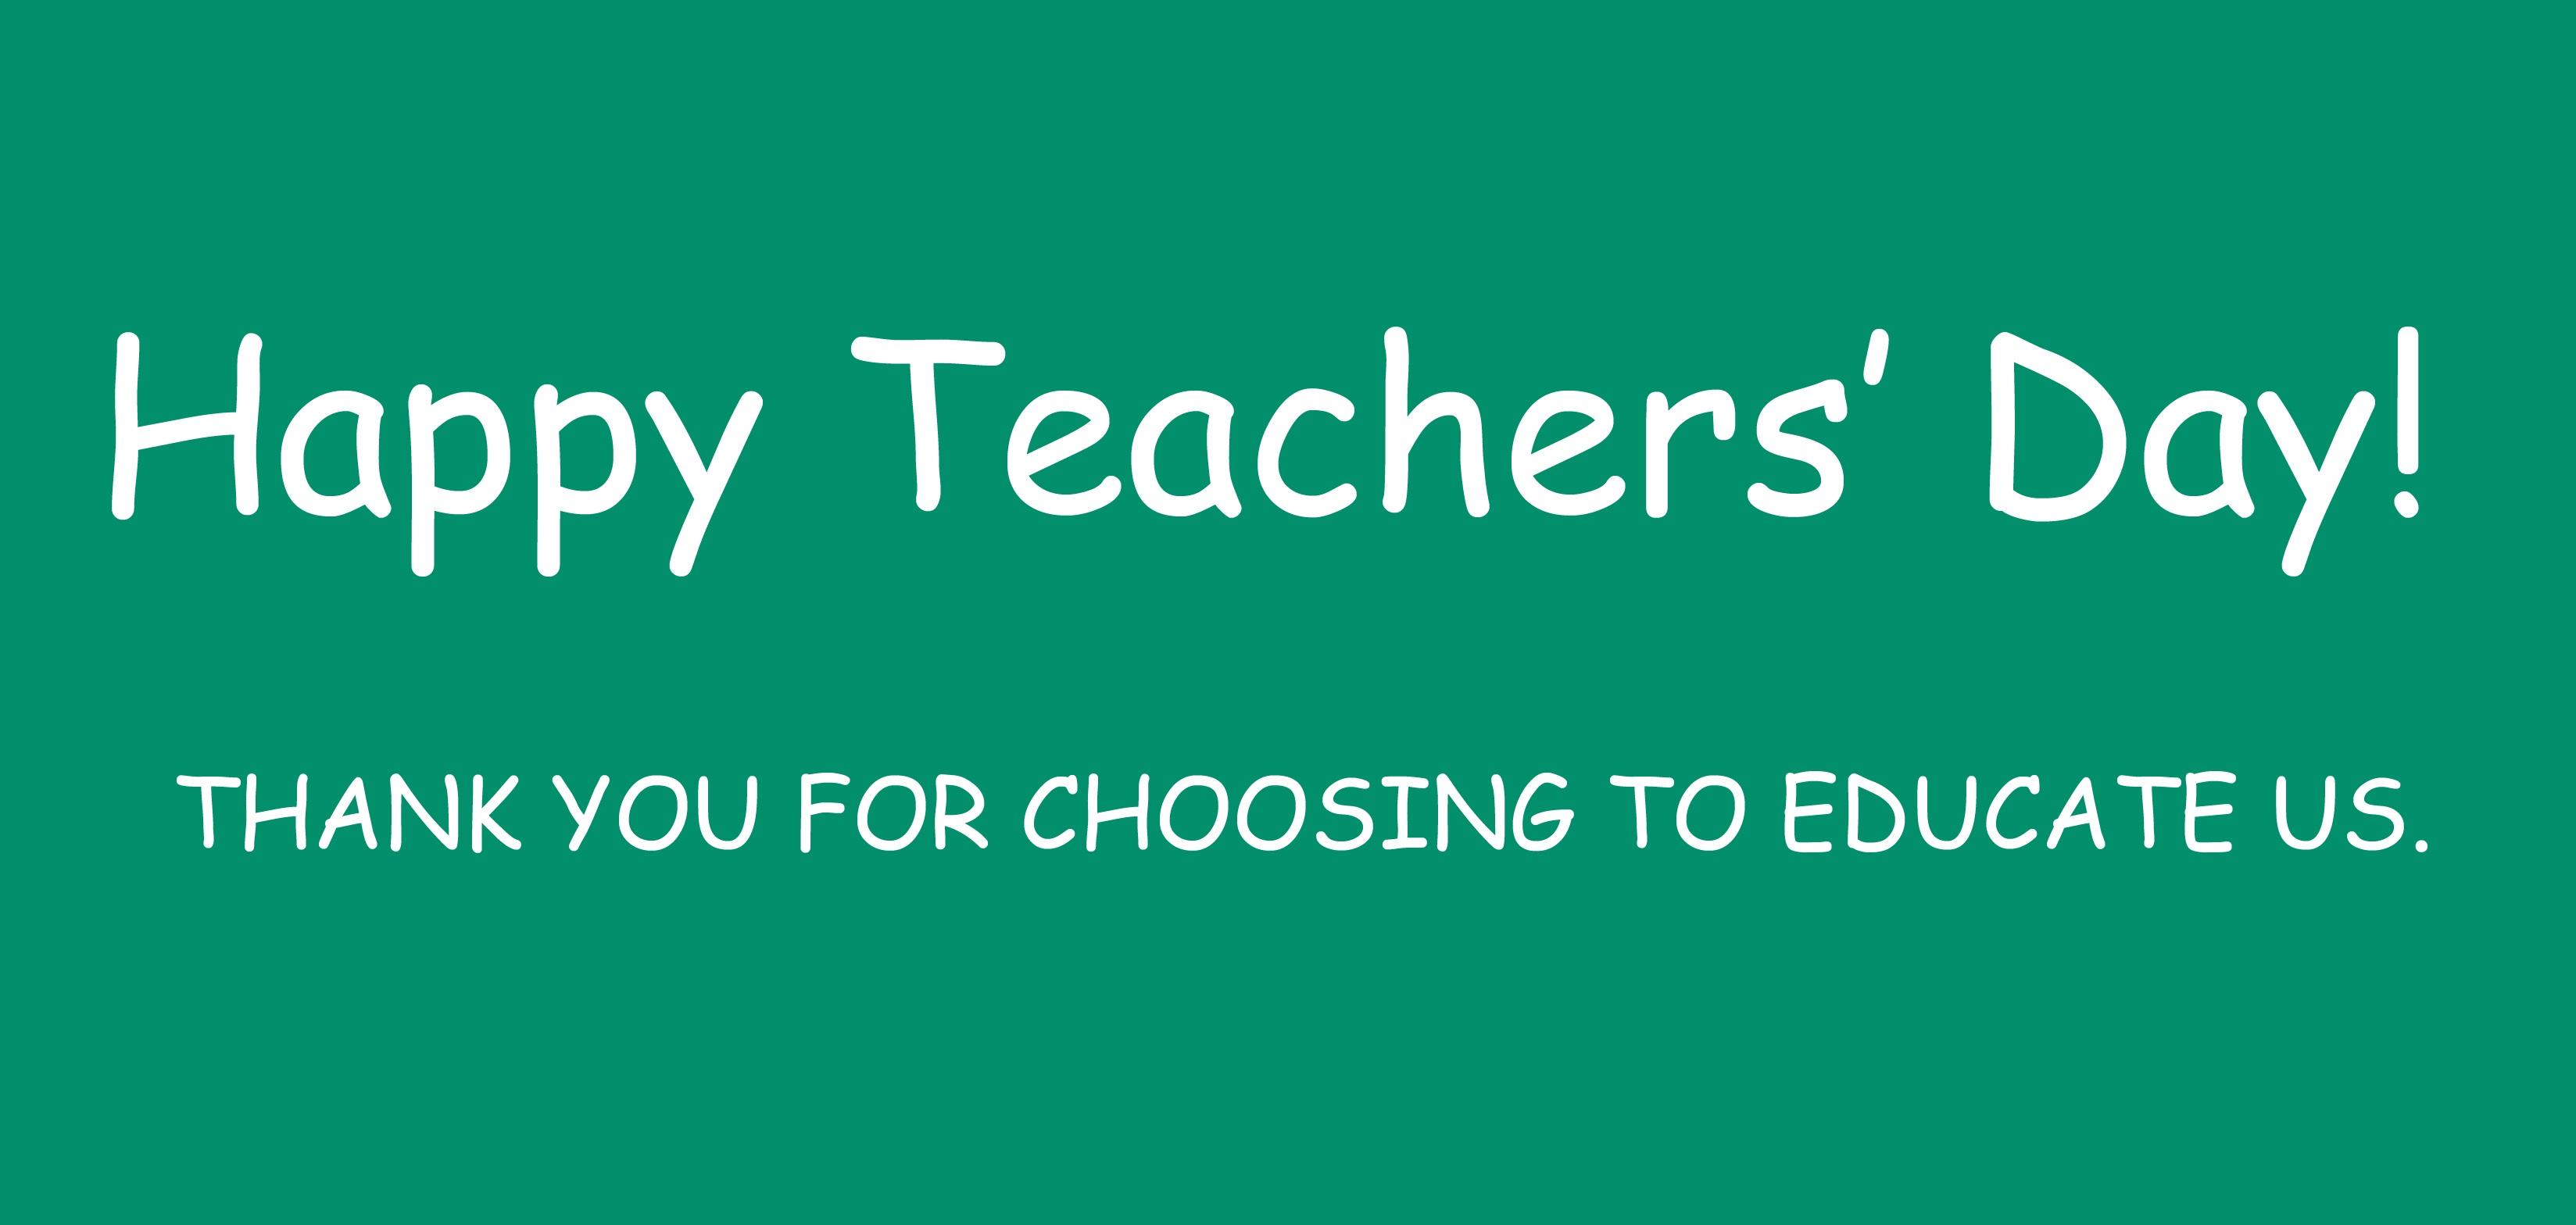 Teacher Day Quotes Happy Teachers Day Quotes 2017 2018